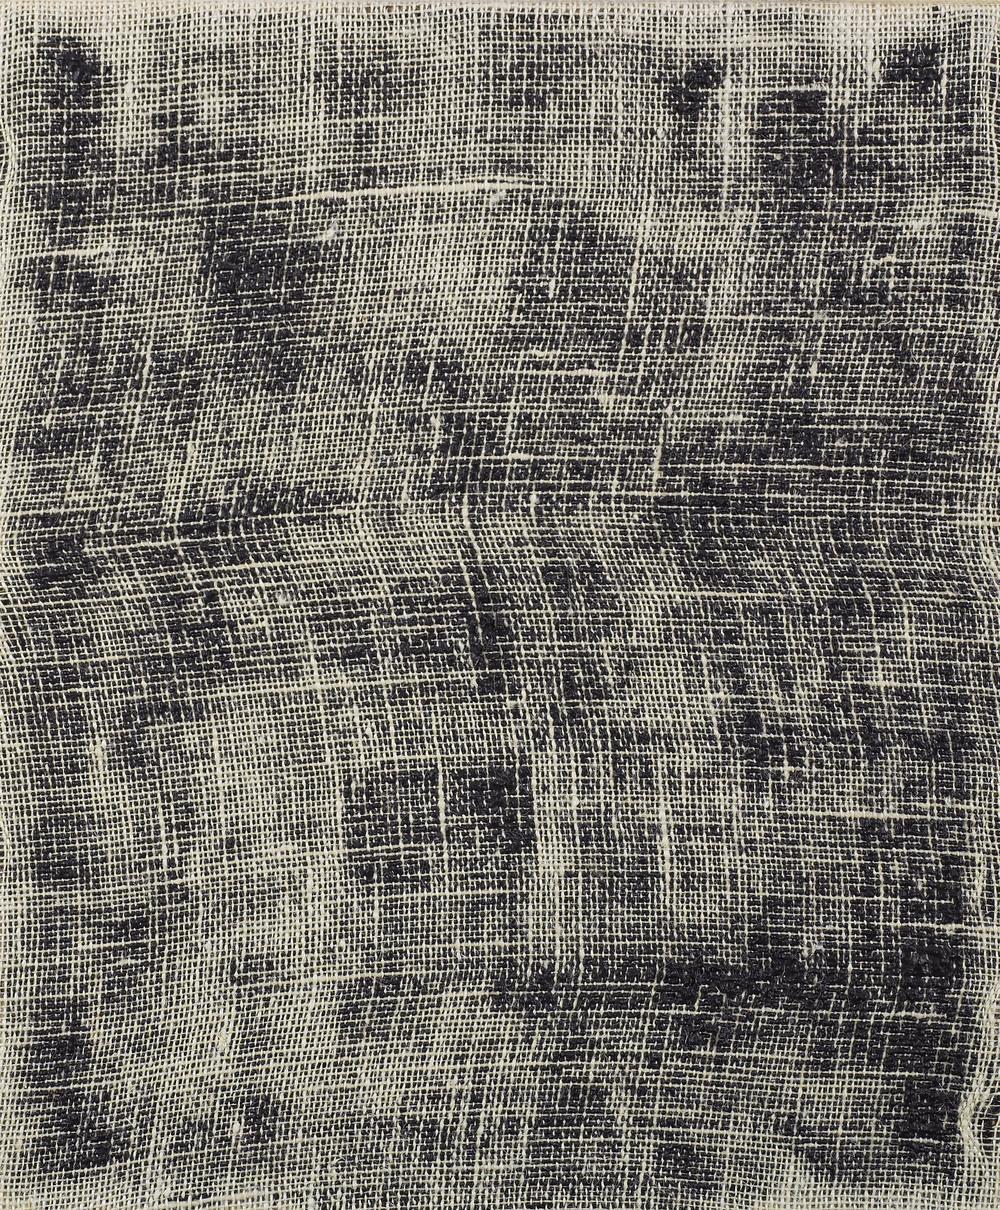 Porosity (Black II), 2014, acrylic on burlap, 20 x 16 inches